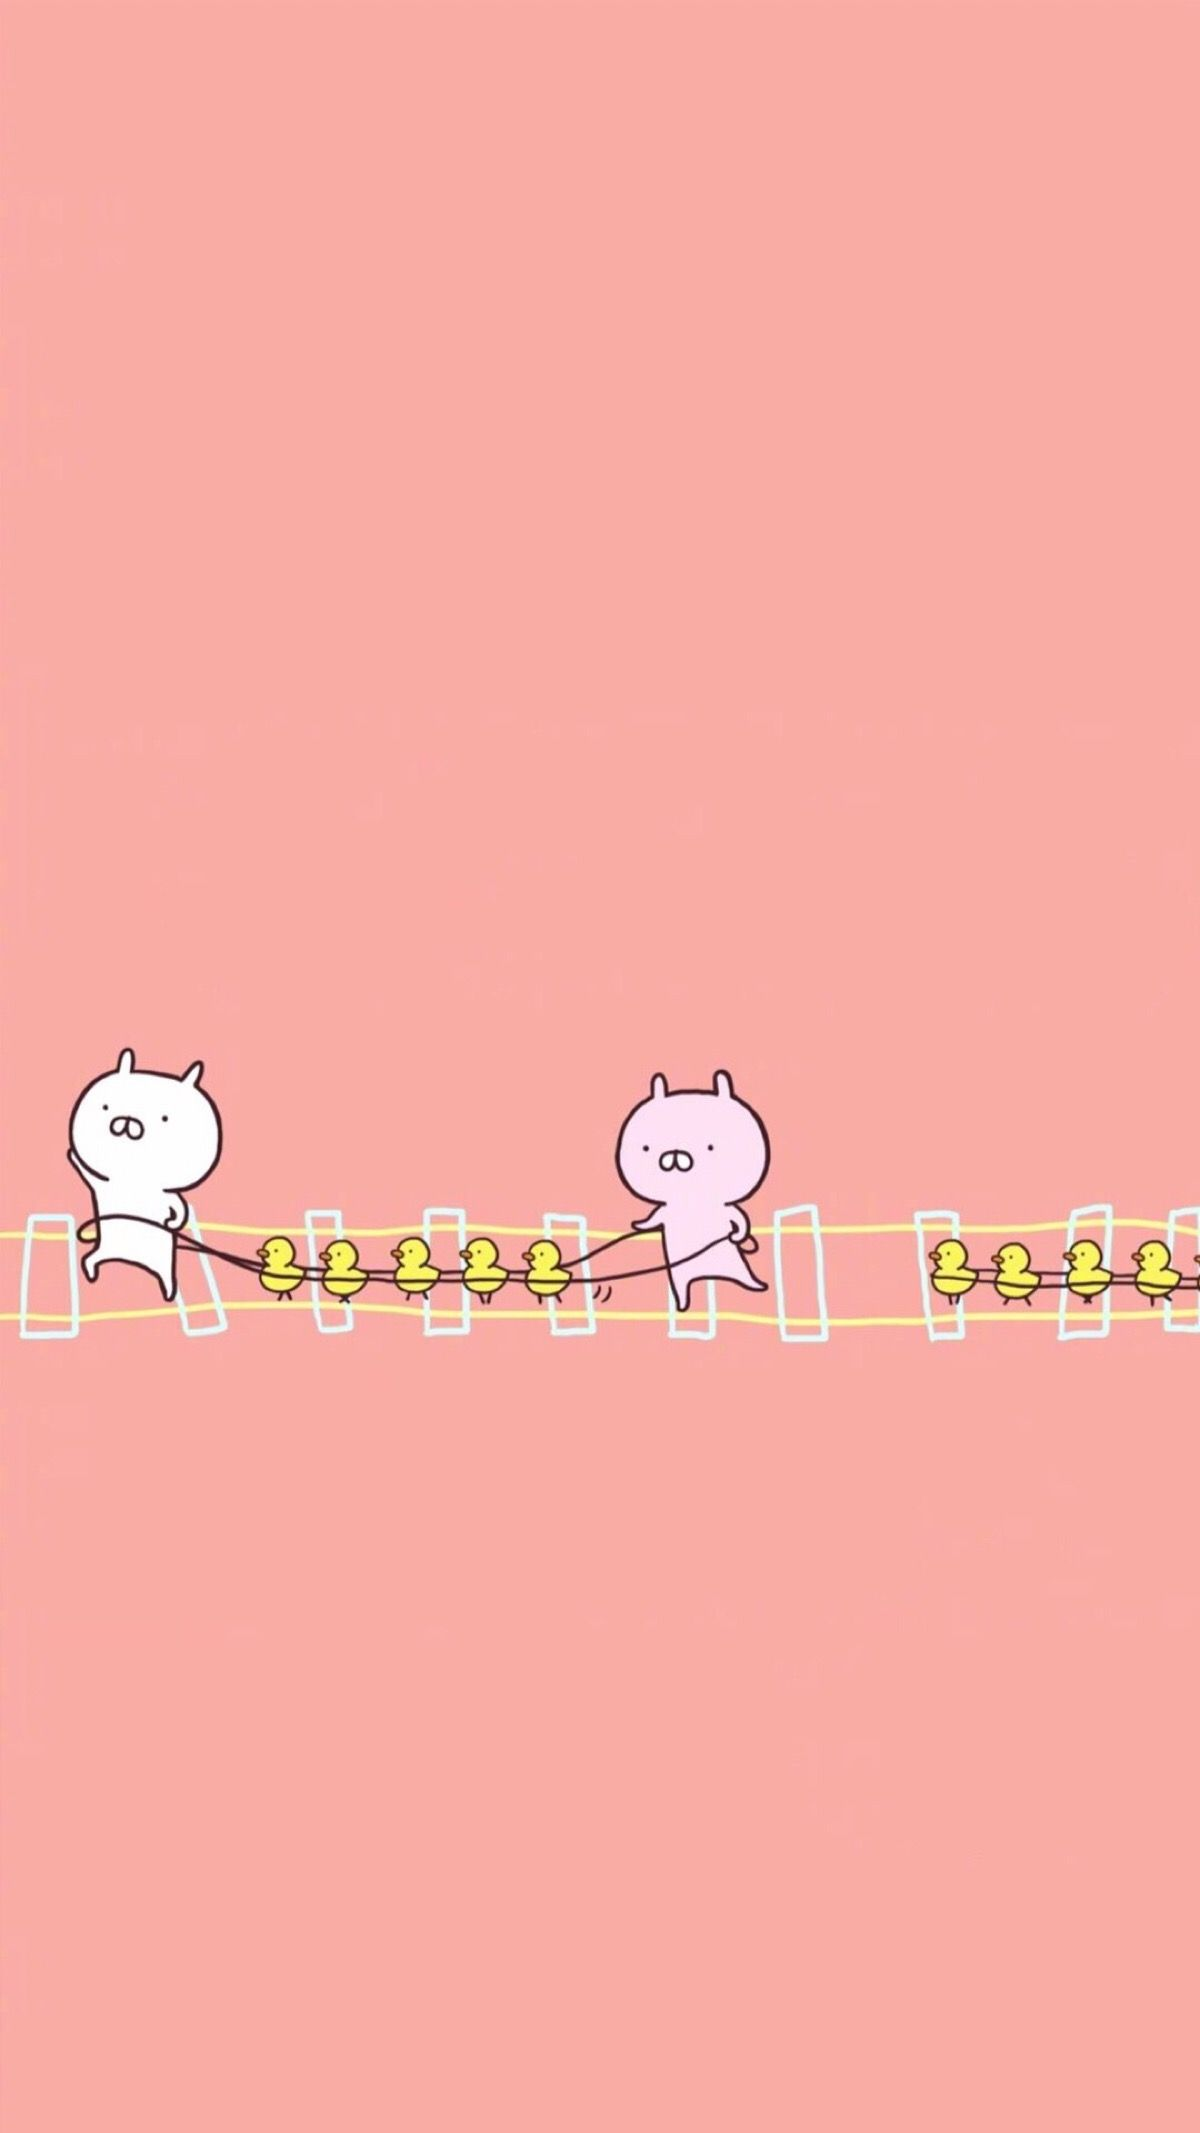 Cute Small Things おしゃれまとめの人気アイデア Pinterest Wall E